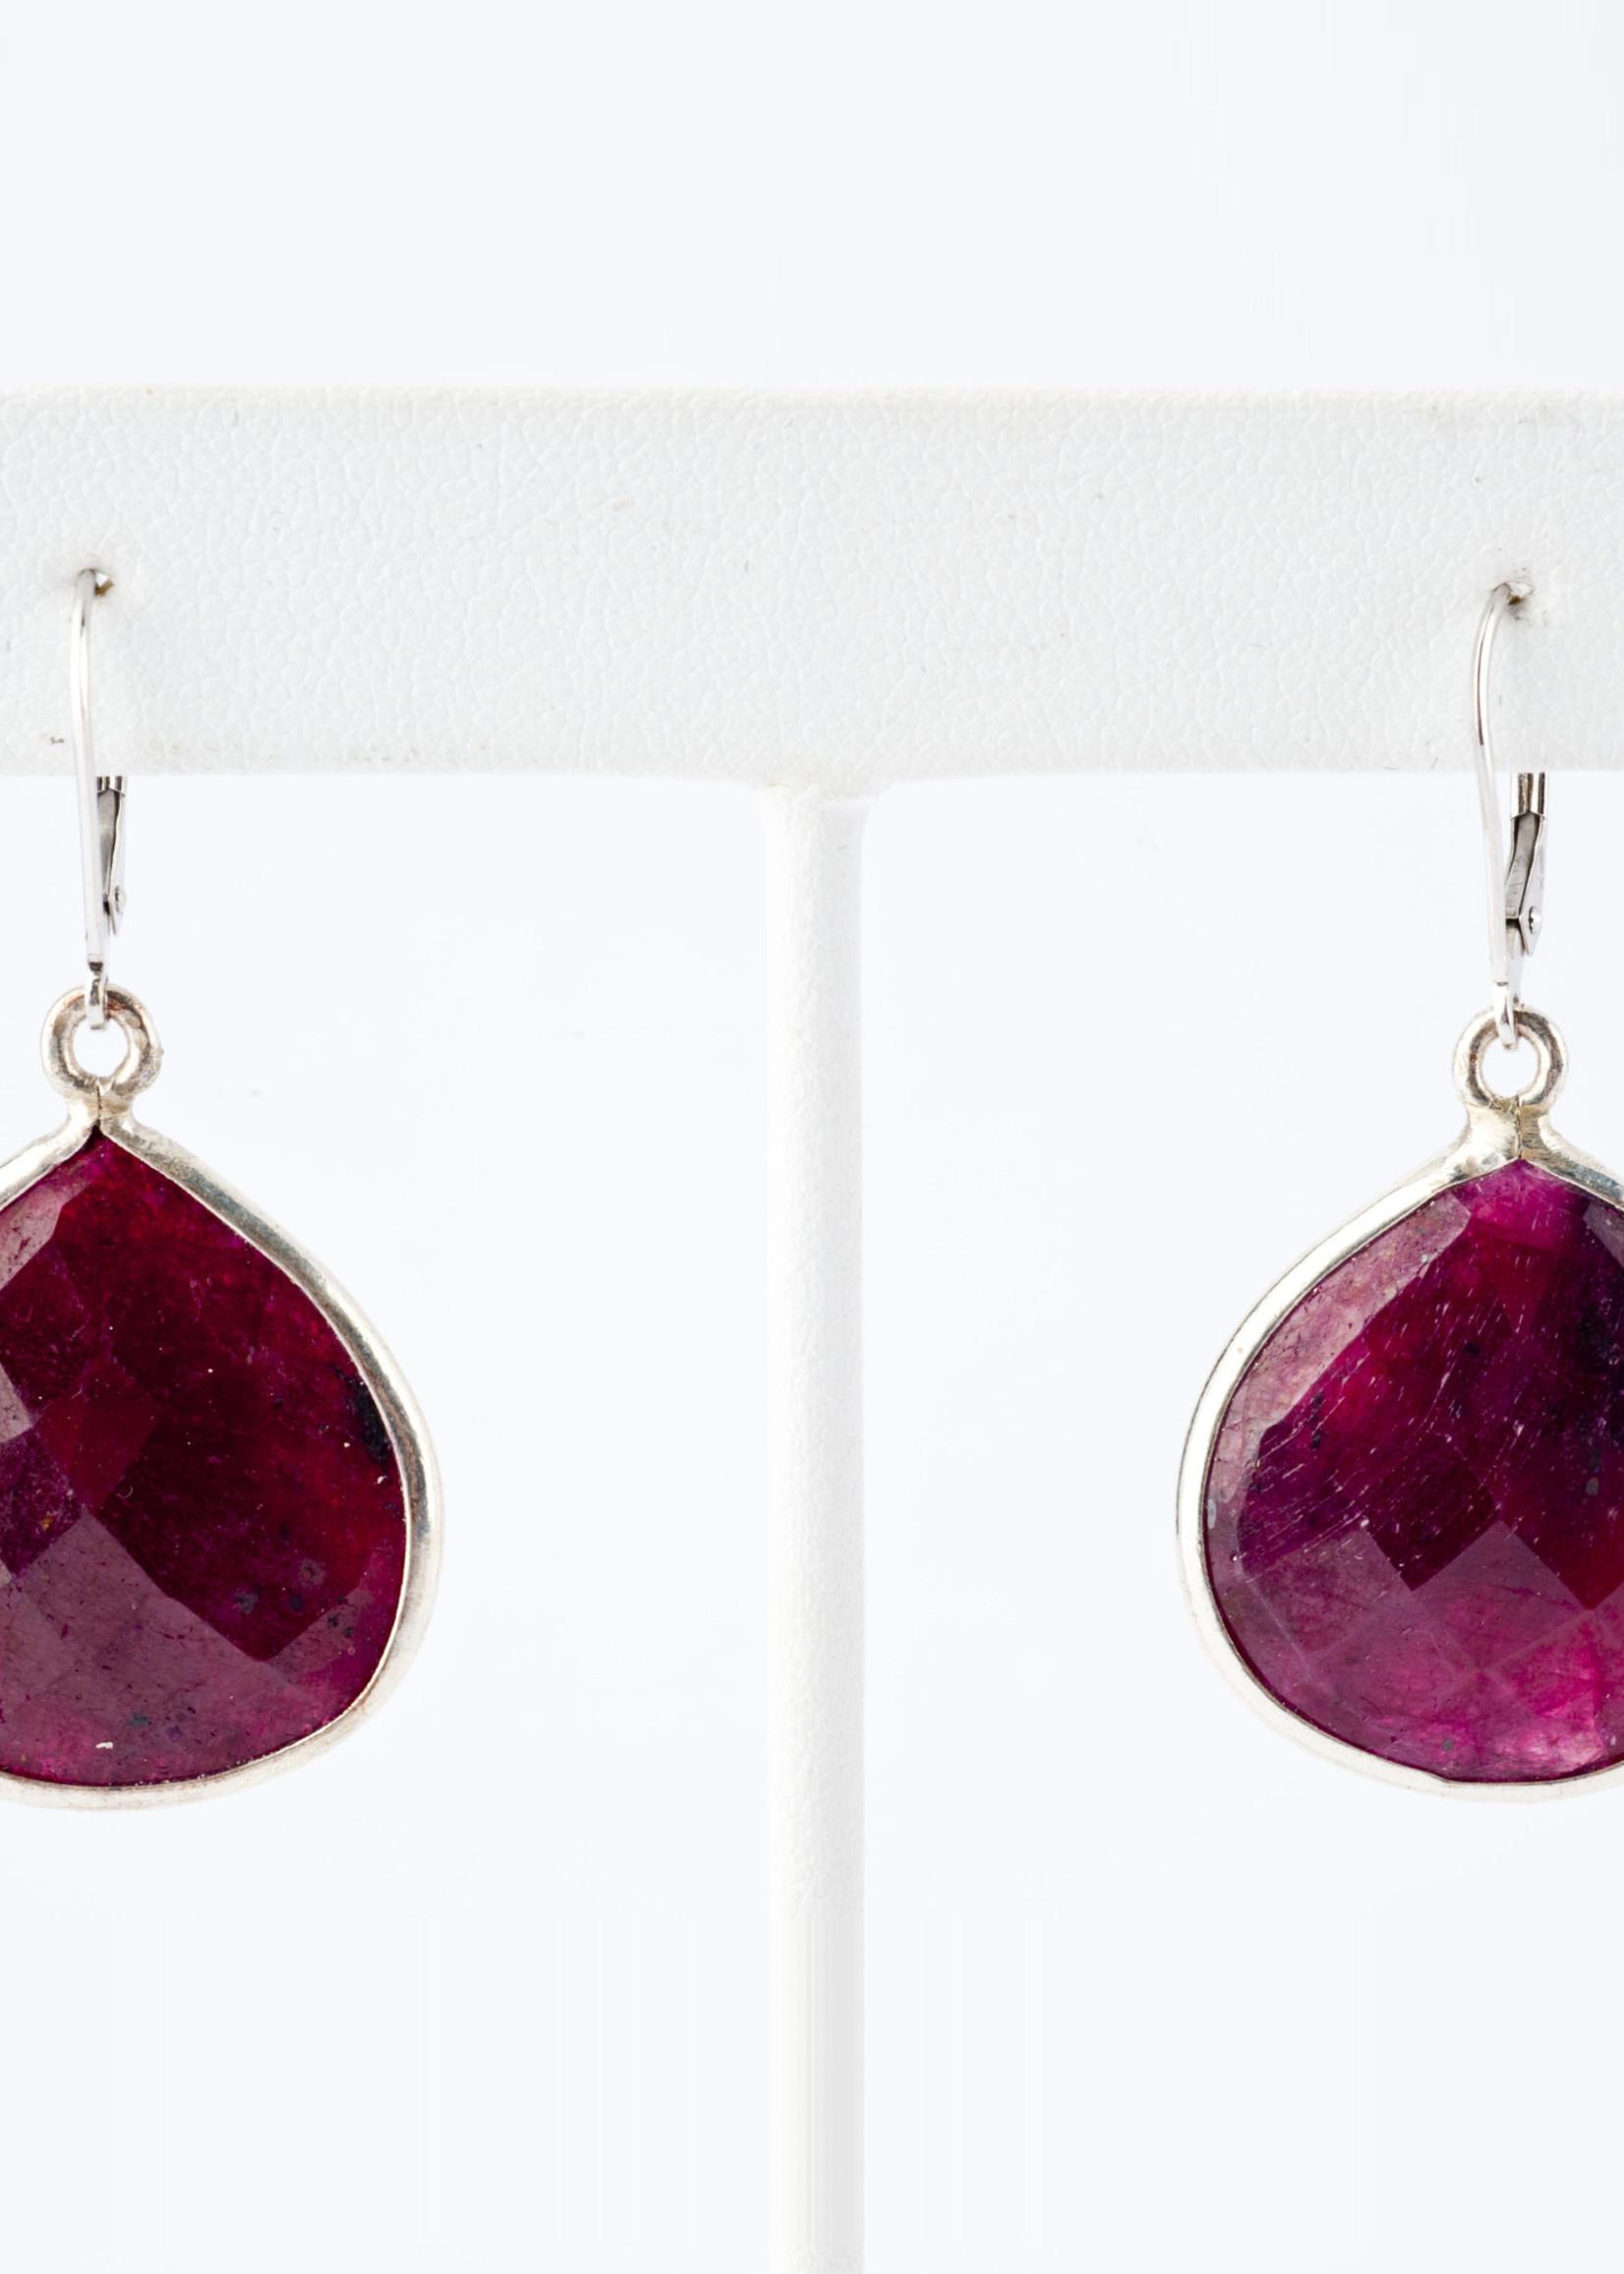 Mina Danielle Ruby Pear Shaped Earrings